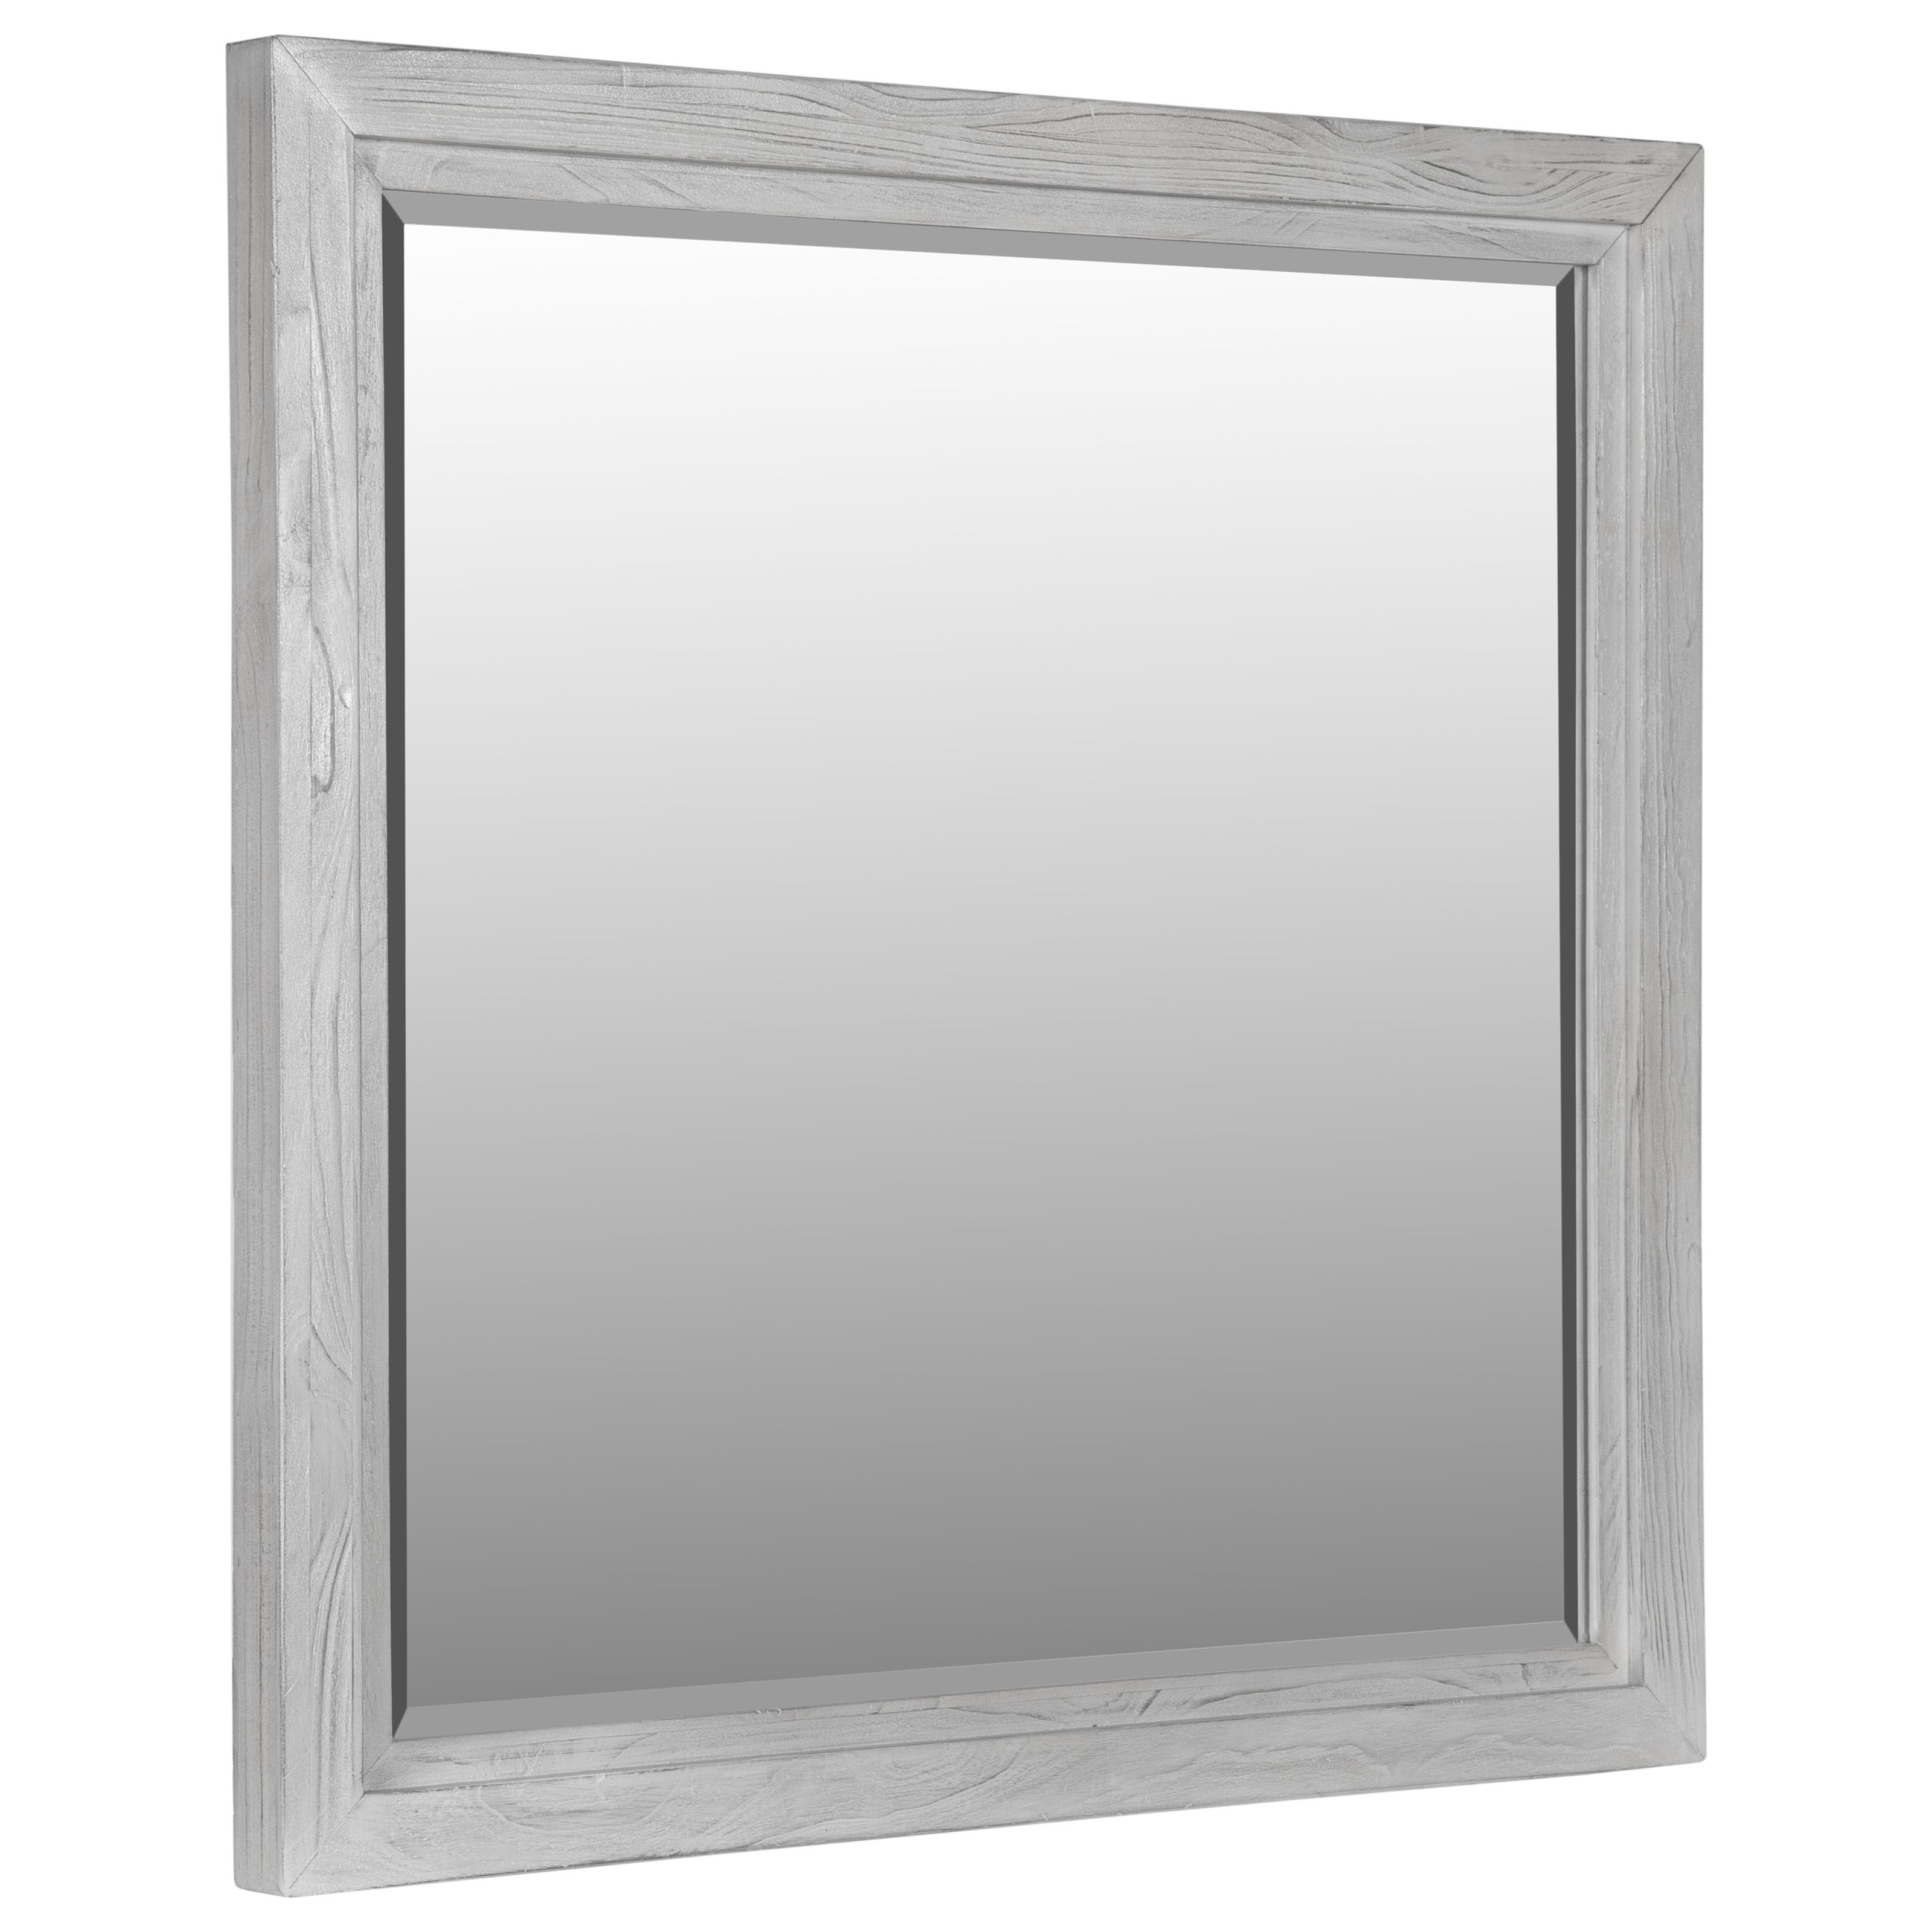 Modus International Boho Chic Plain Mirror In Washed White Reeds Furniture Dresser Mirrors